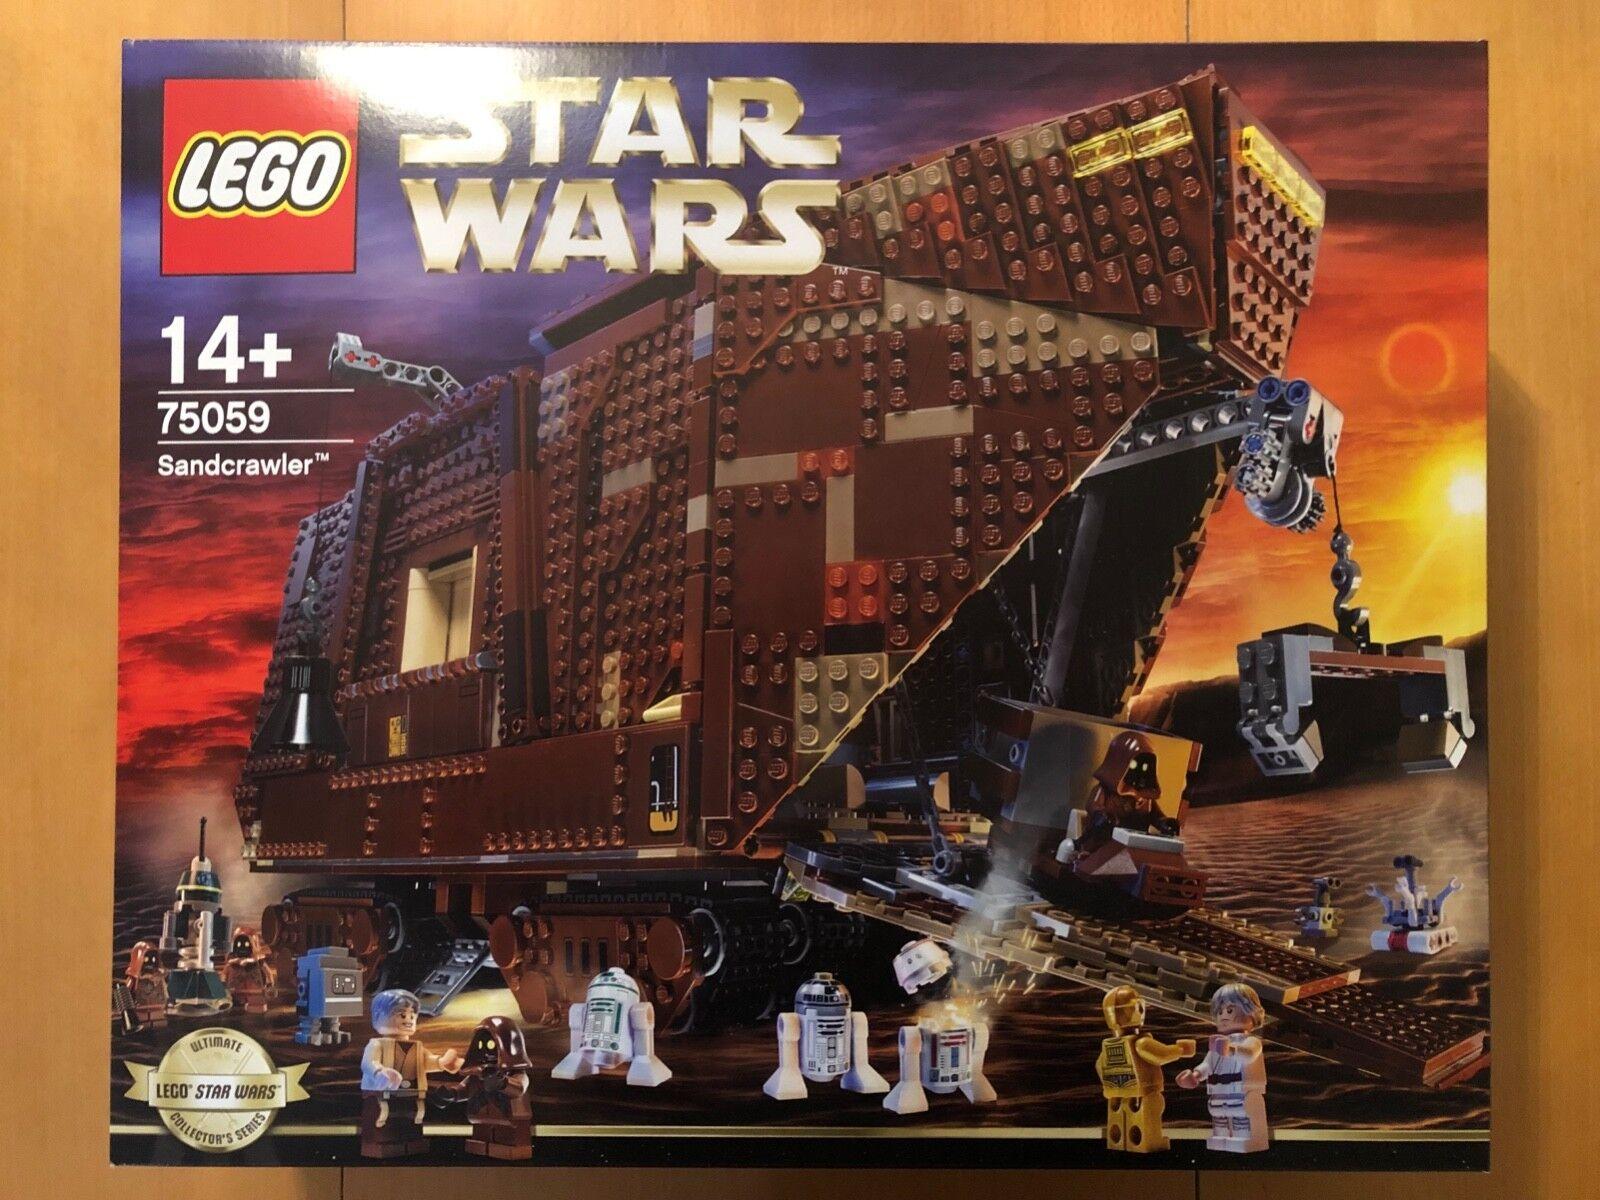 LEGO Star Wars Sandcrawler (75059) - UCS - Neuf, Scellés intacts